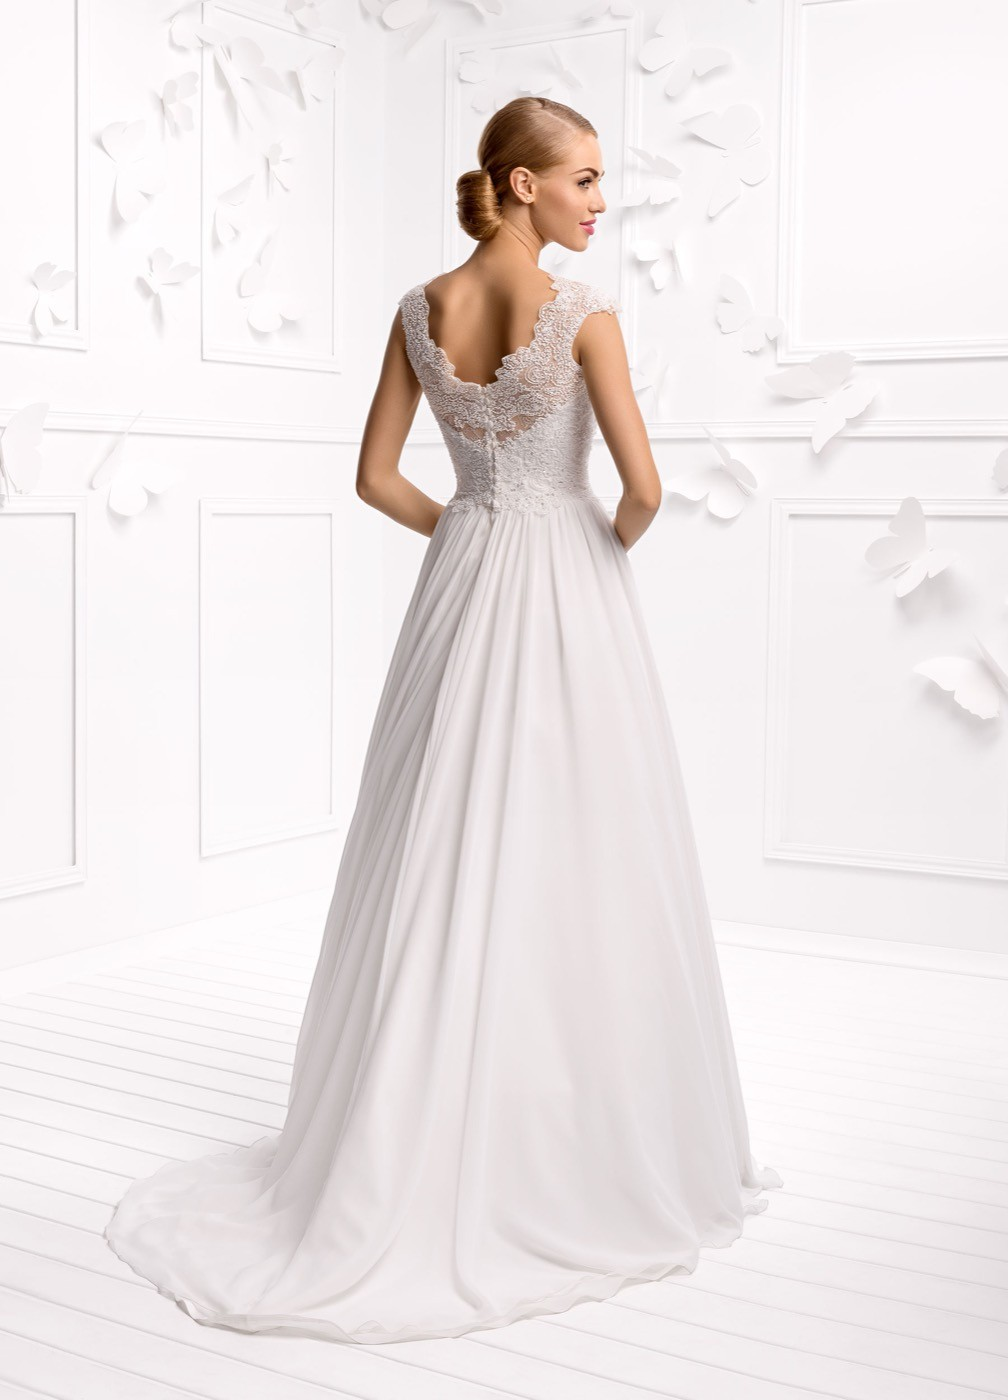 Matrimonio Spiaggia Pesaro : Pesaro vendita online abiti da sposa economici su misura